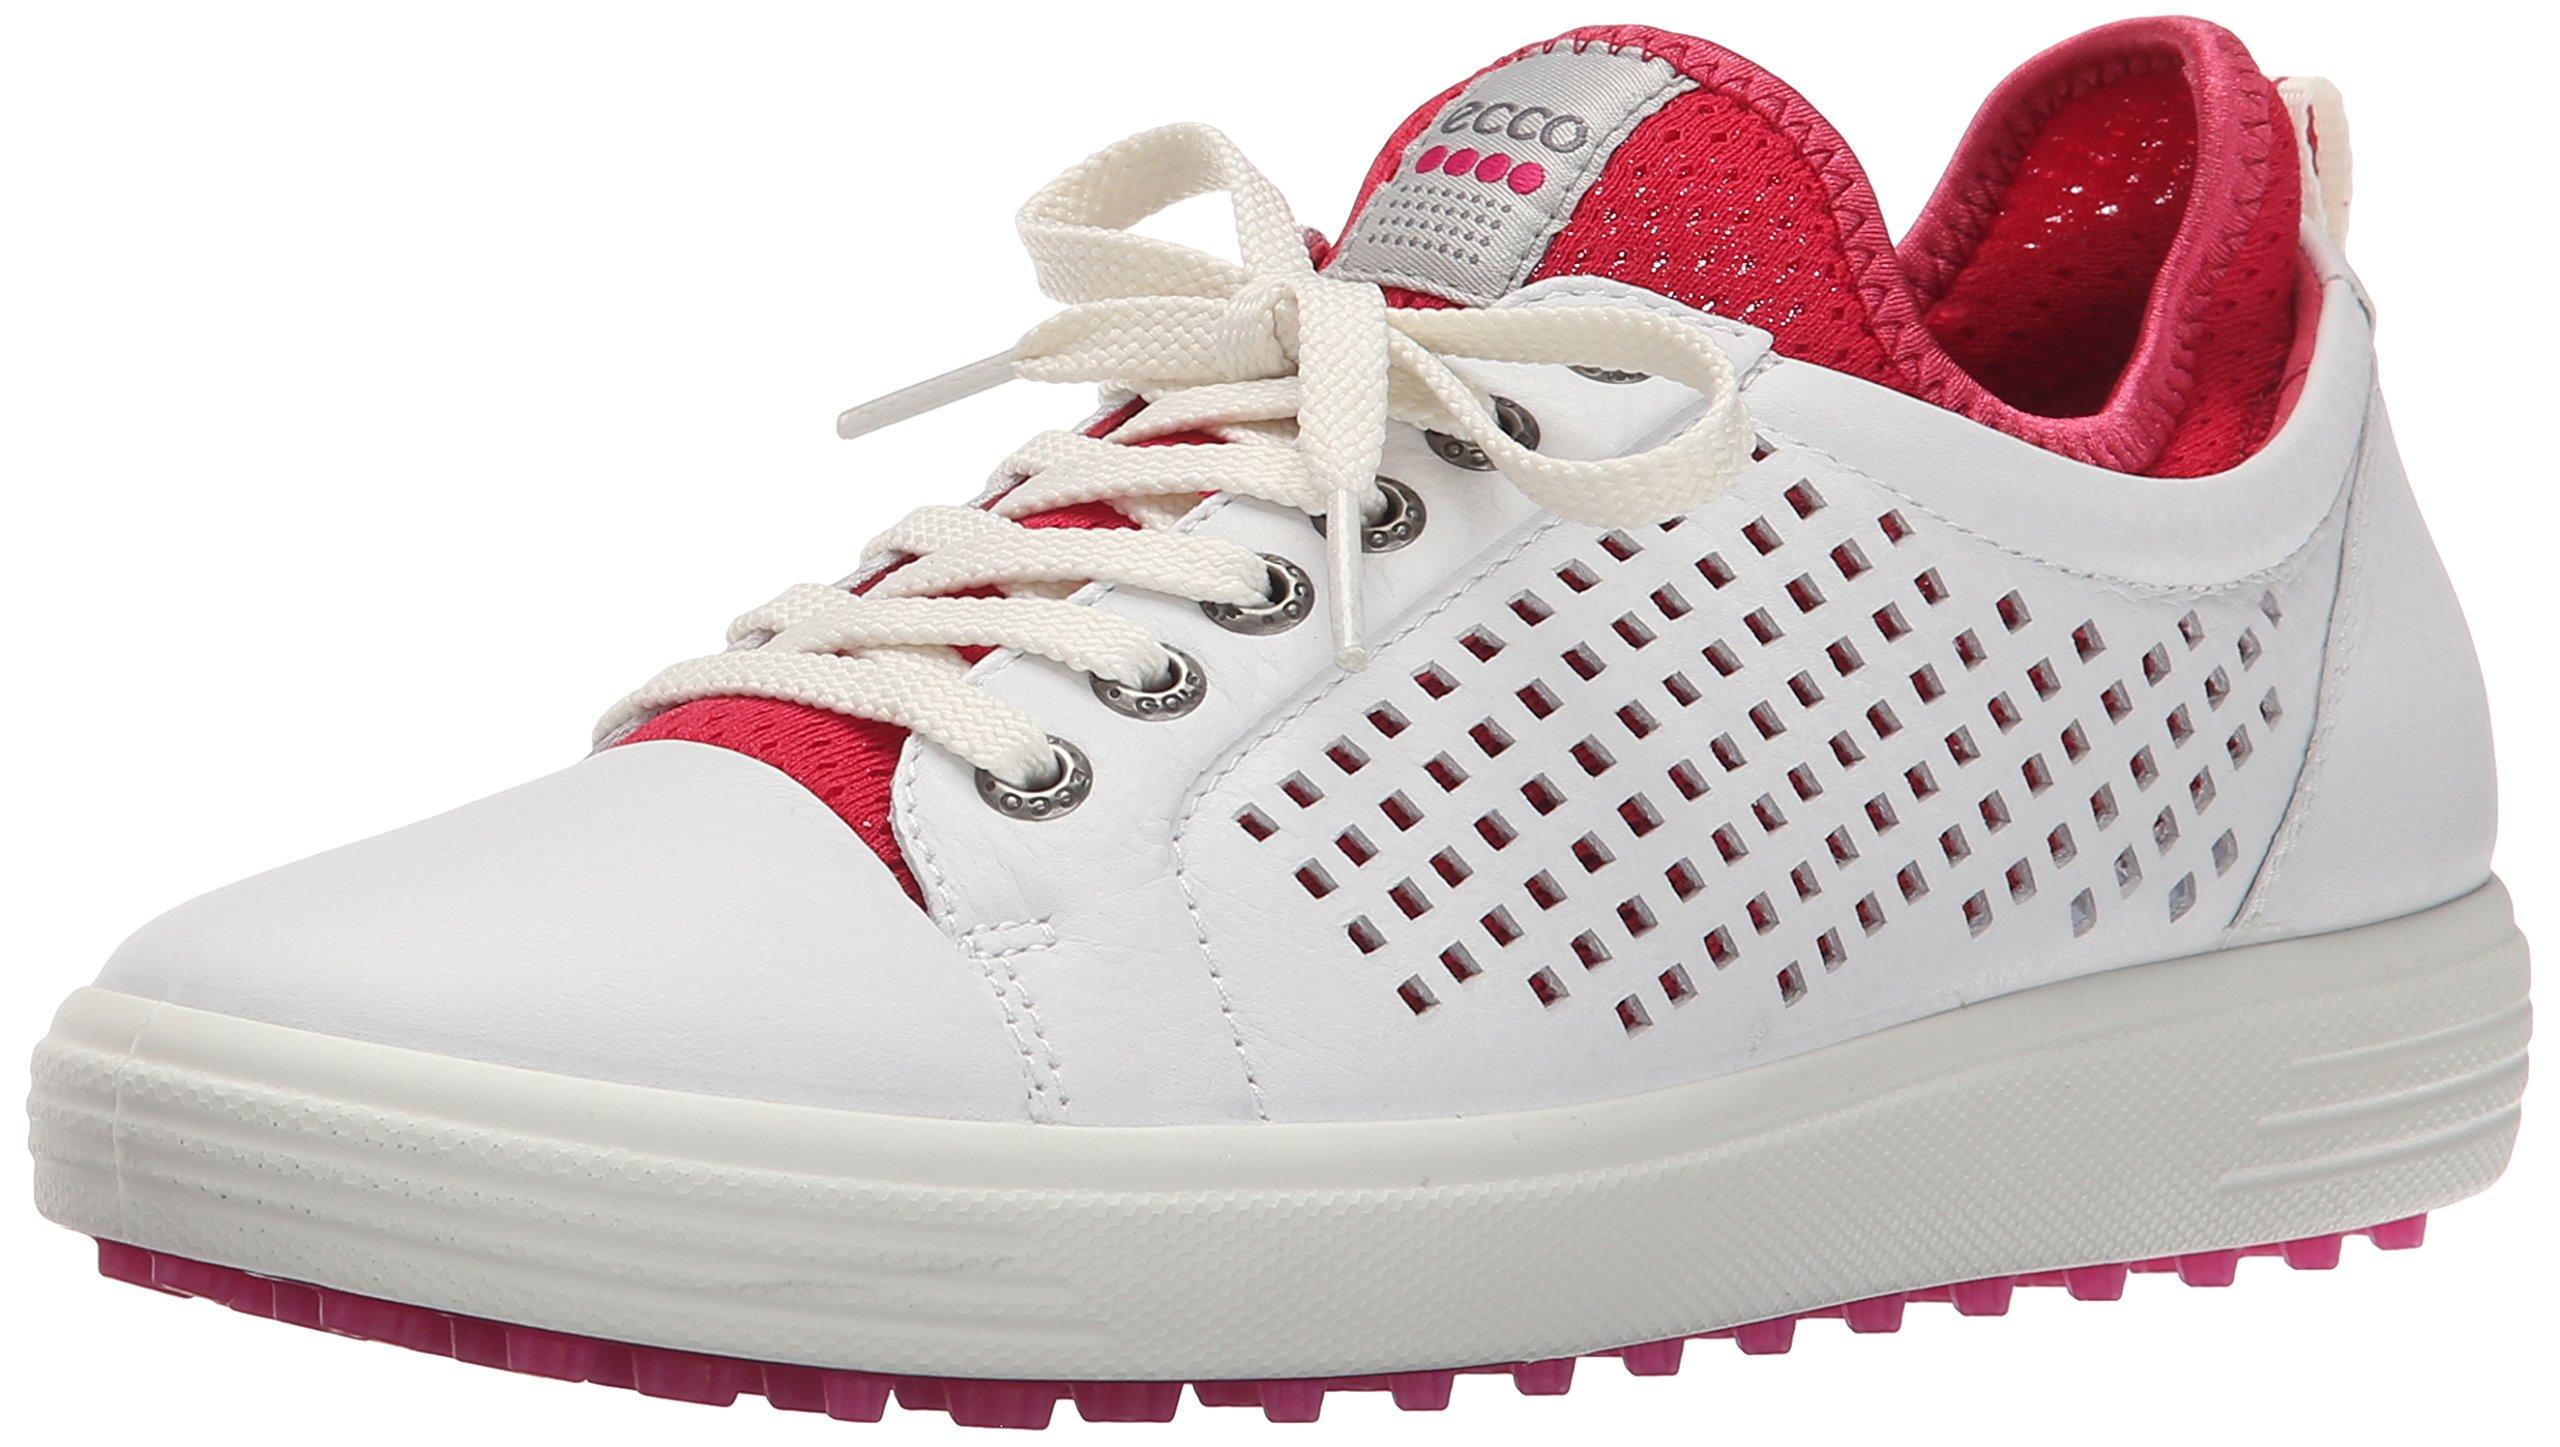 ECCO Women's Summer Hybrid Golf Shoe, White/Raspberry, 41 EU/10-10.5 M US